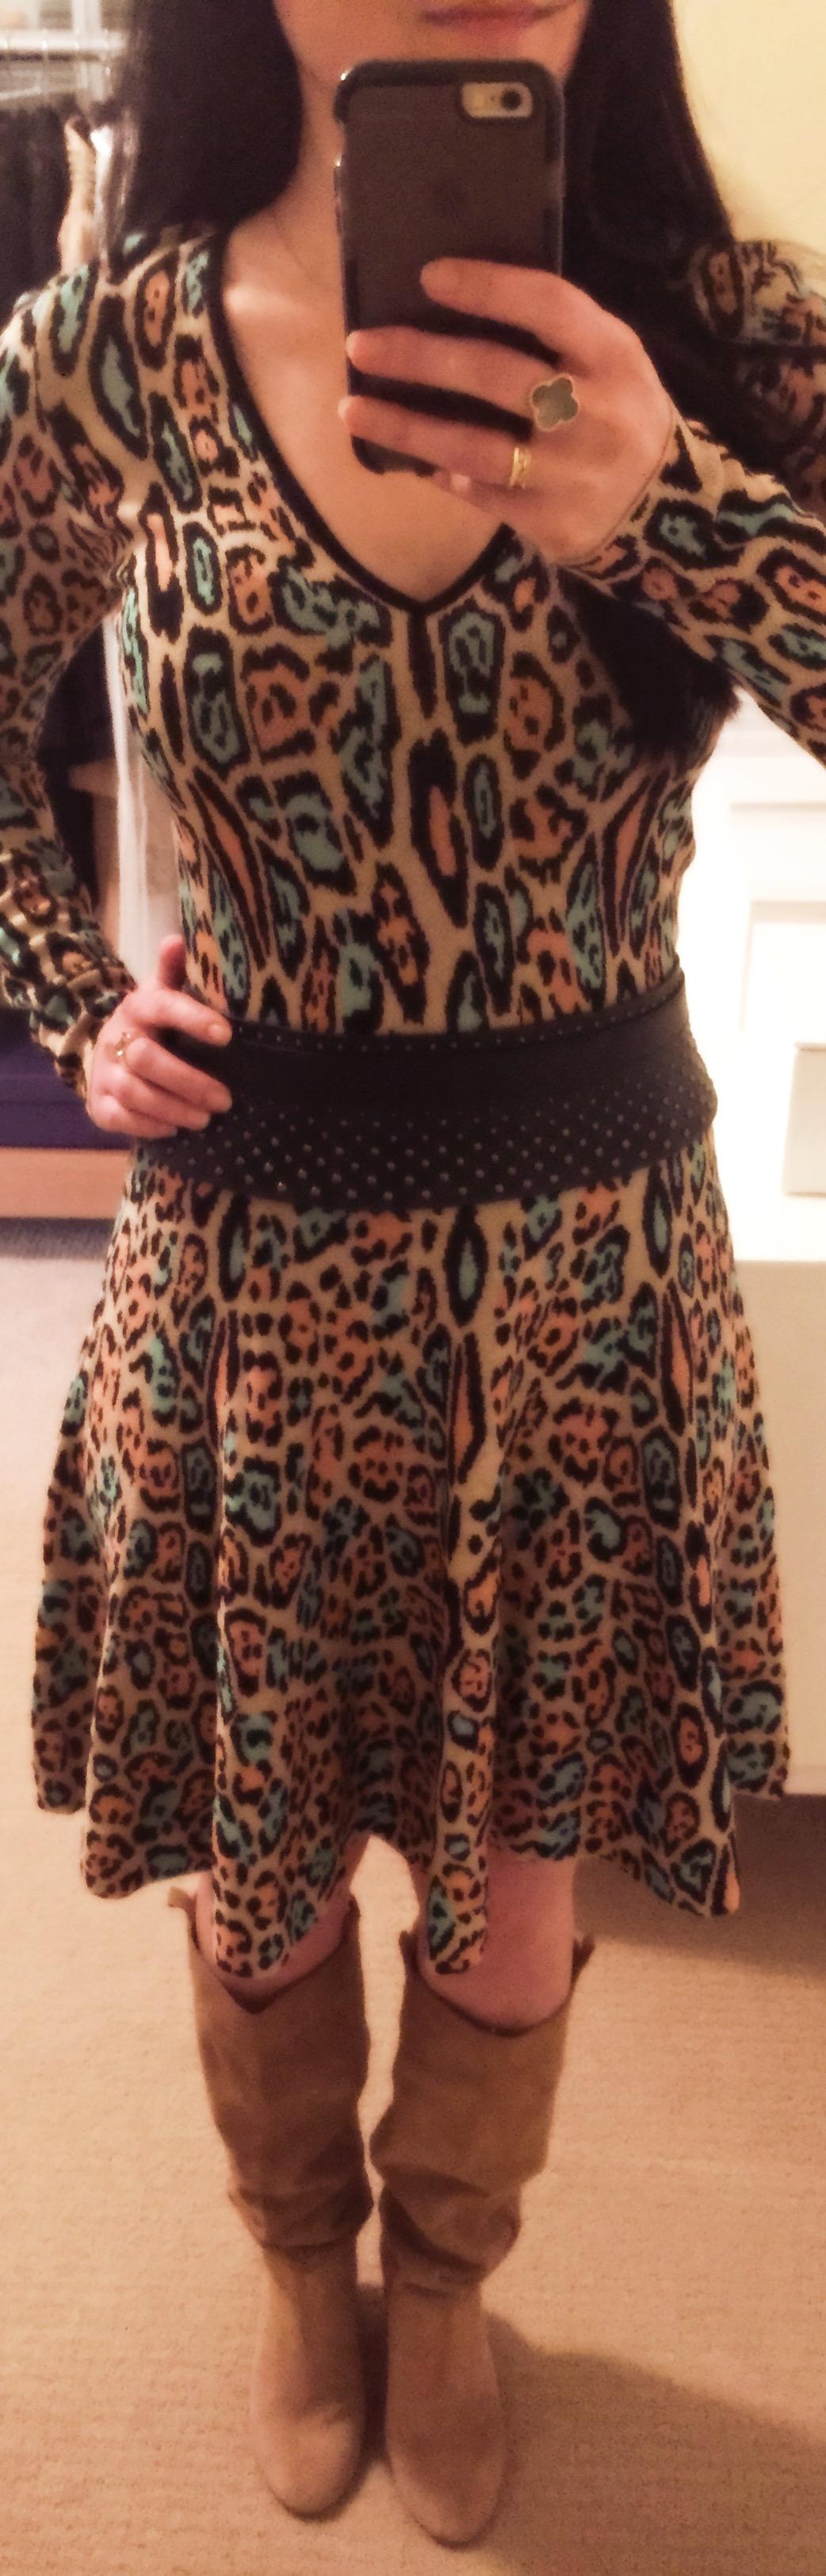 Jan 7, BCBG Colorful Leopard Print Knit Dress